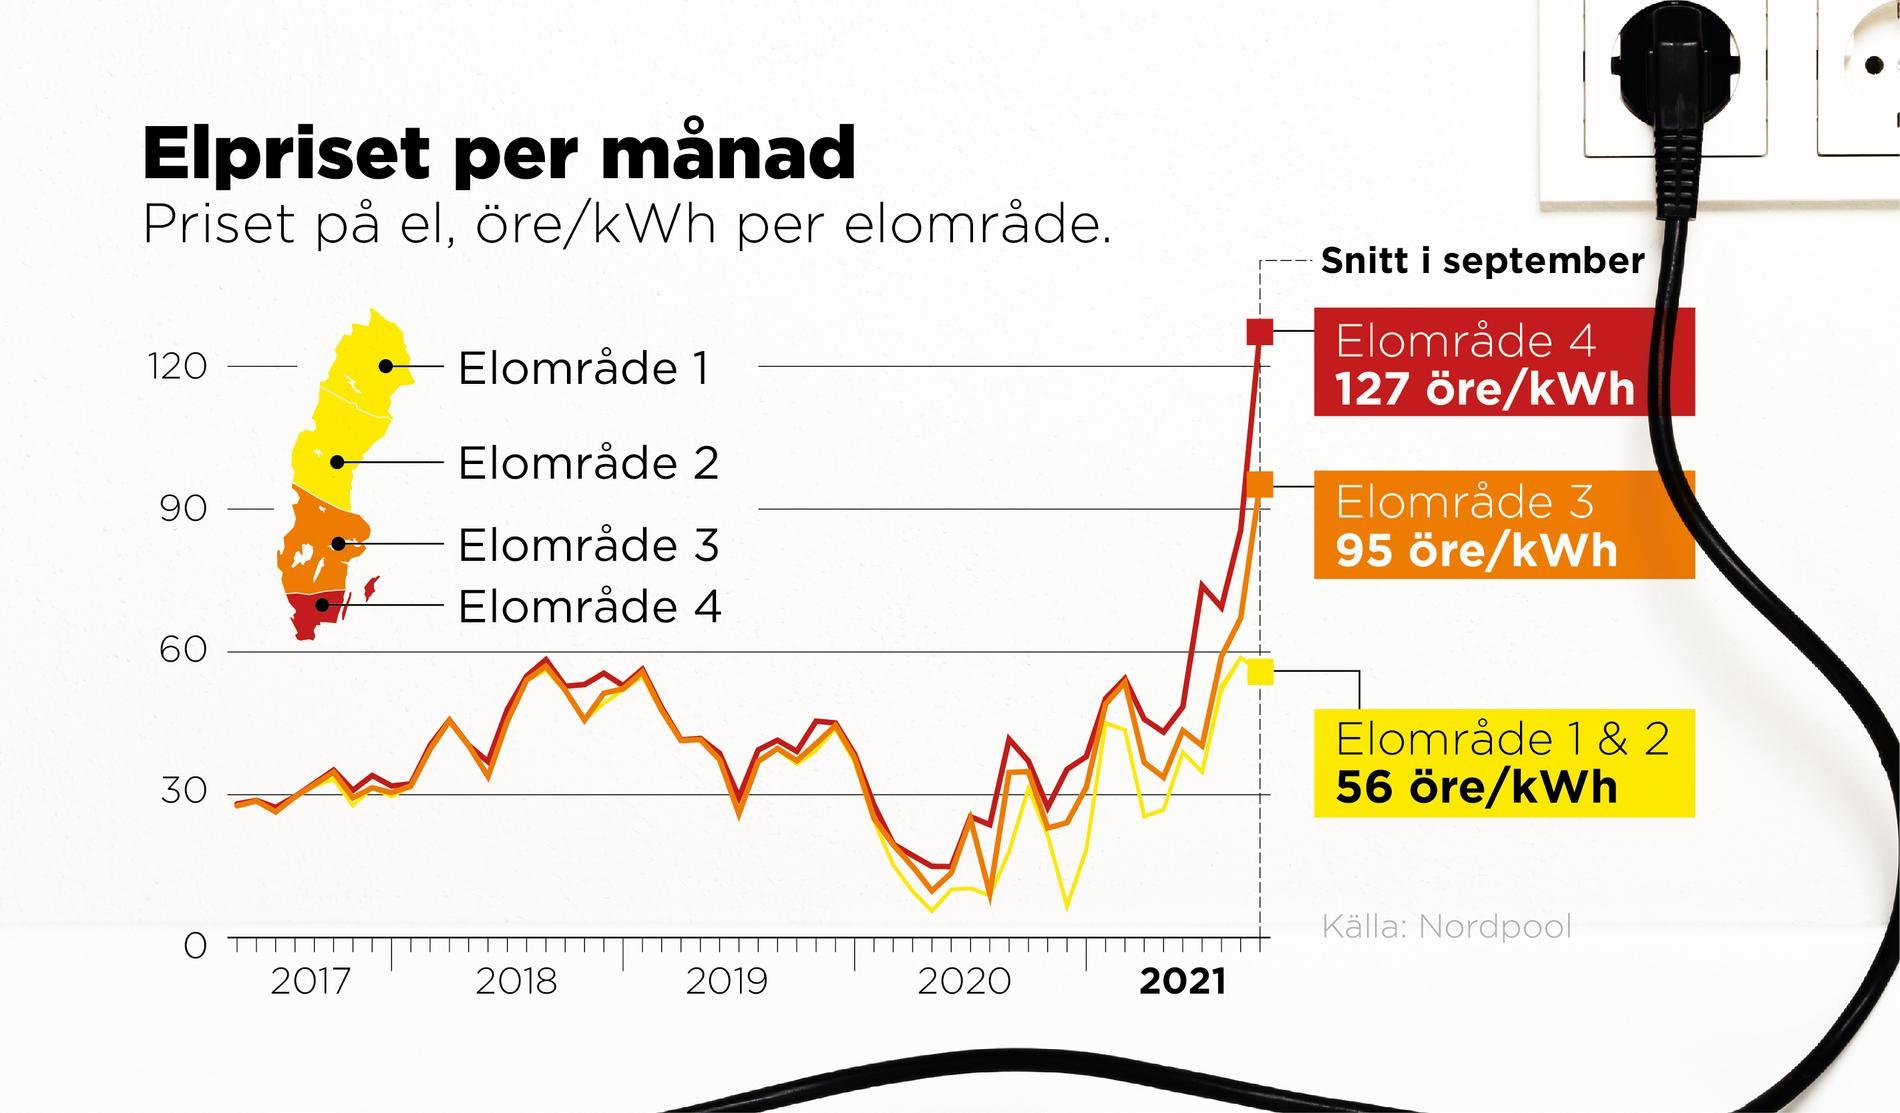 Priset på el, öre/kWh per elområde.